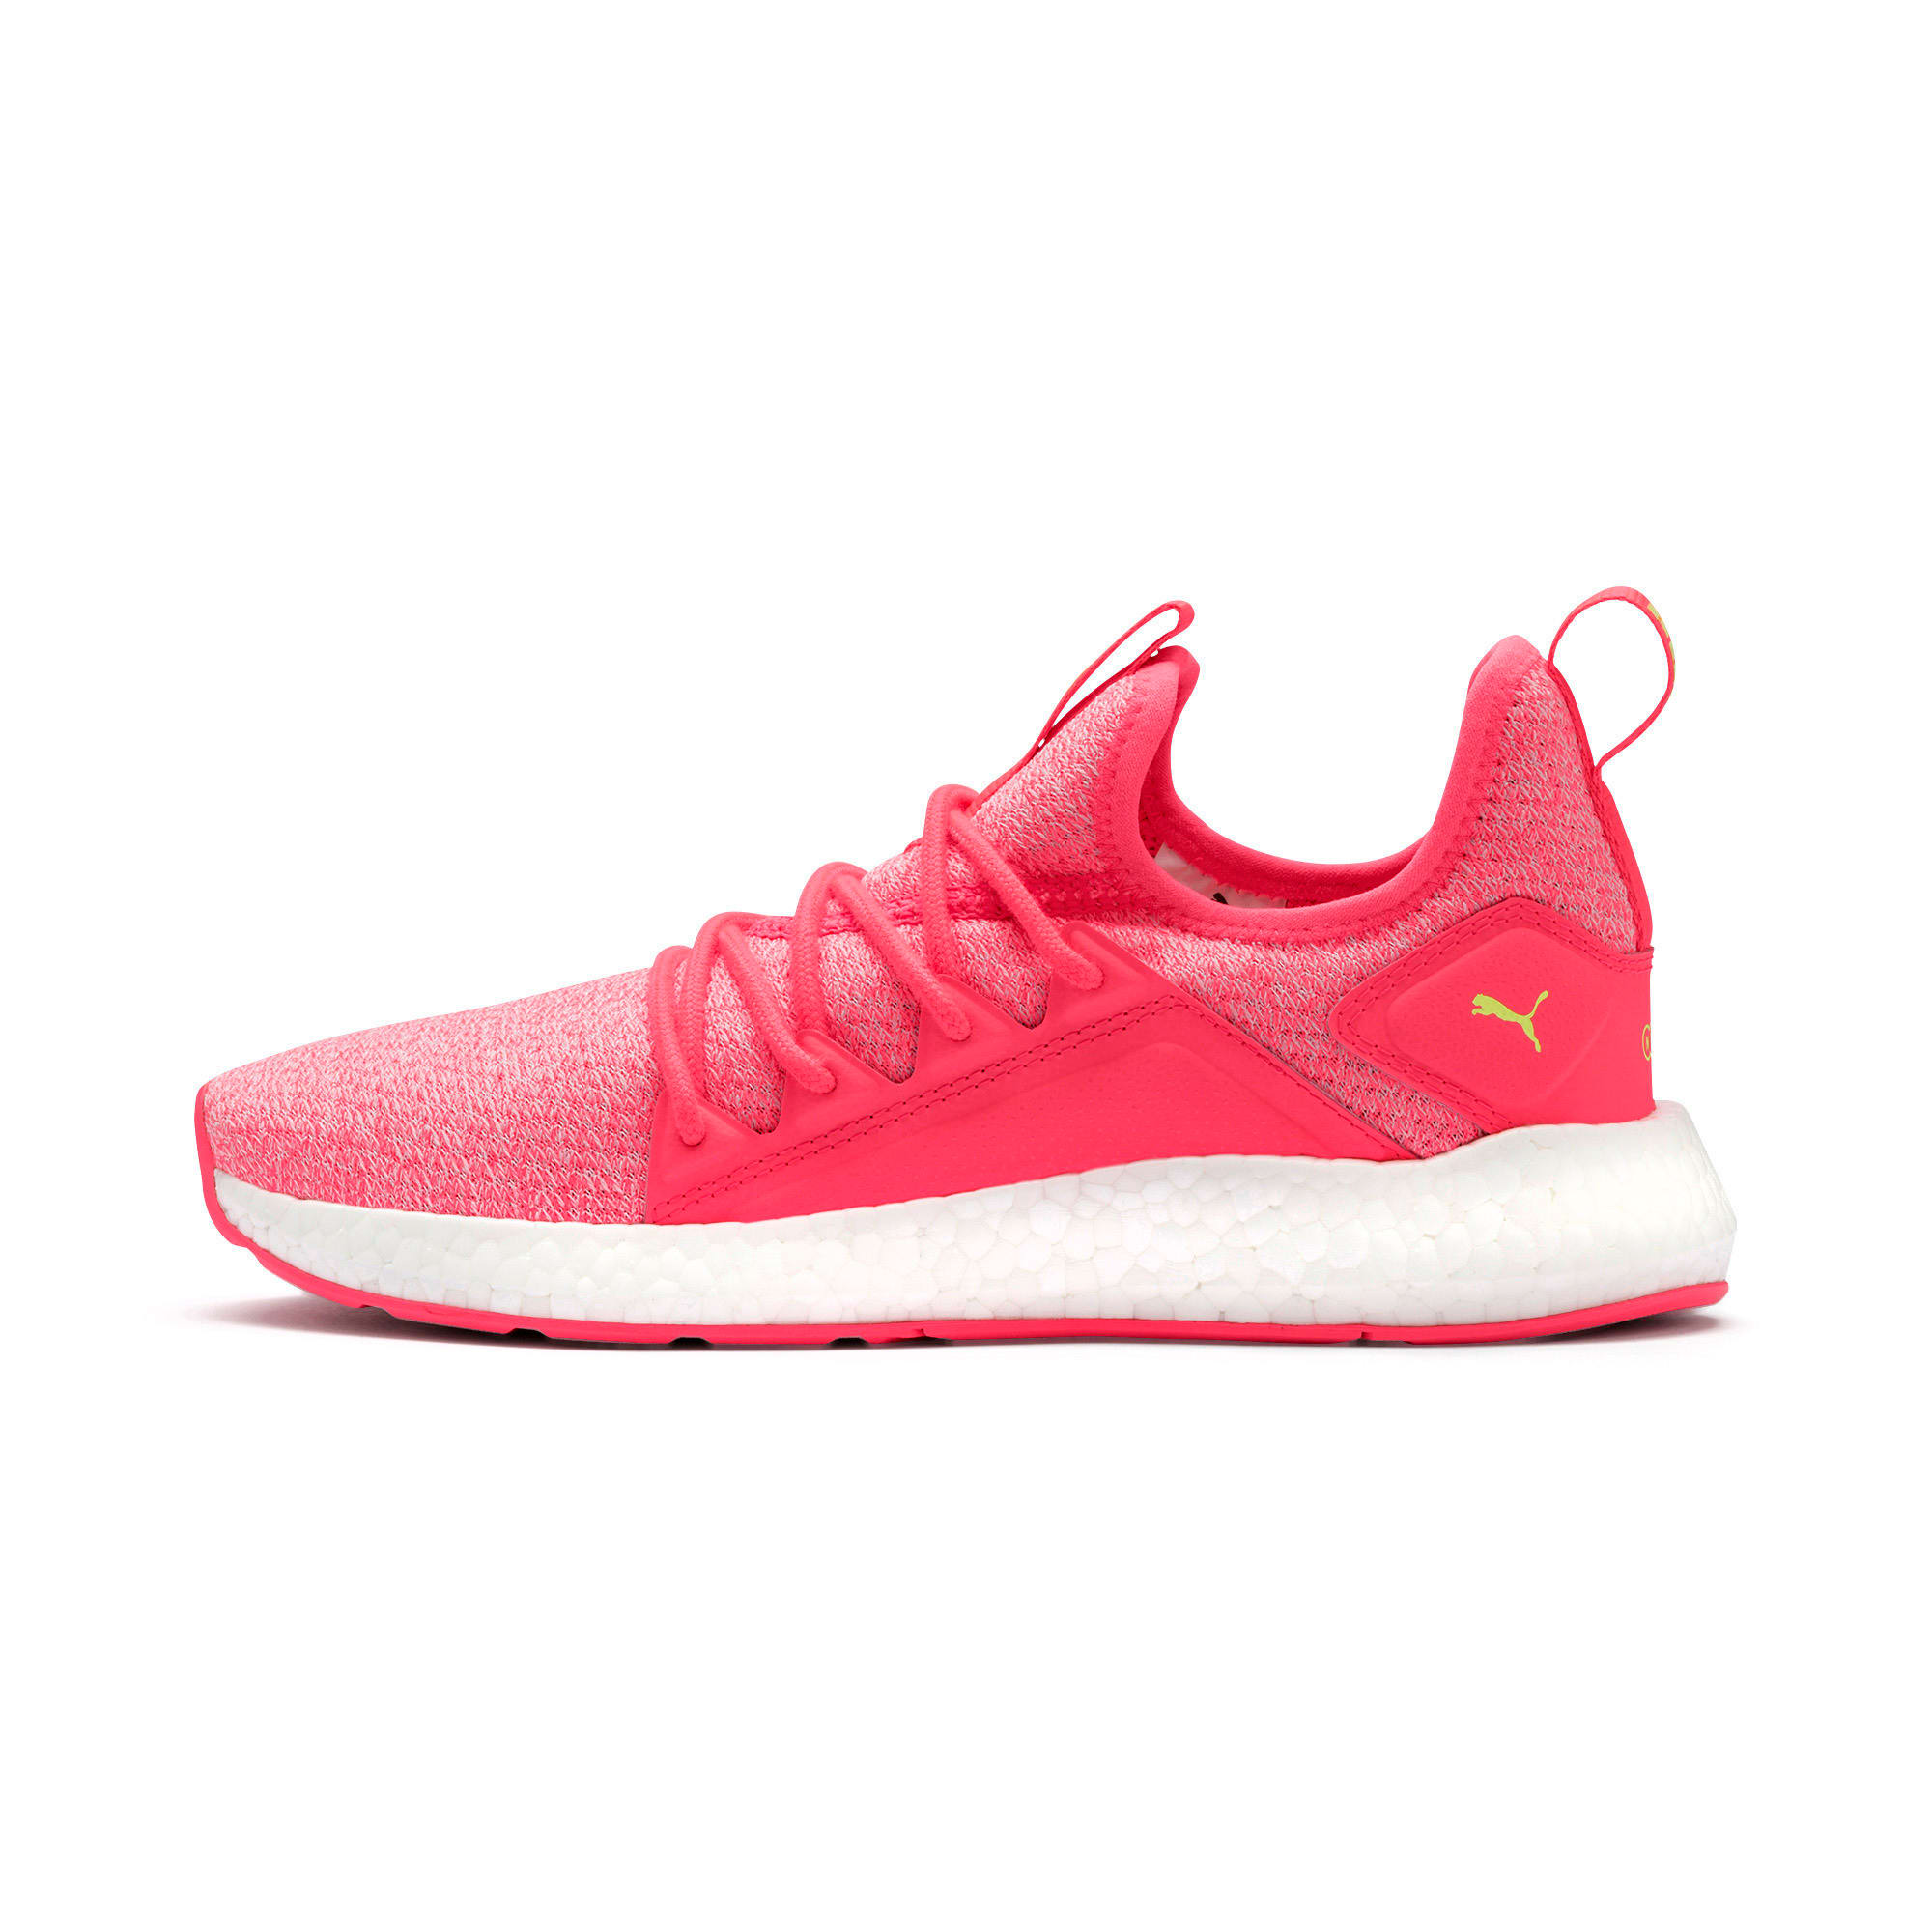 Thumbnail 1 of NRGY Neko Knit Women's Running Shoes, Pink Alert-Puma White, medium